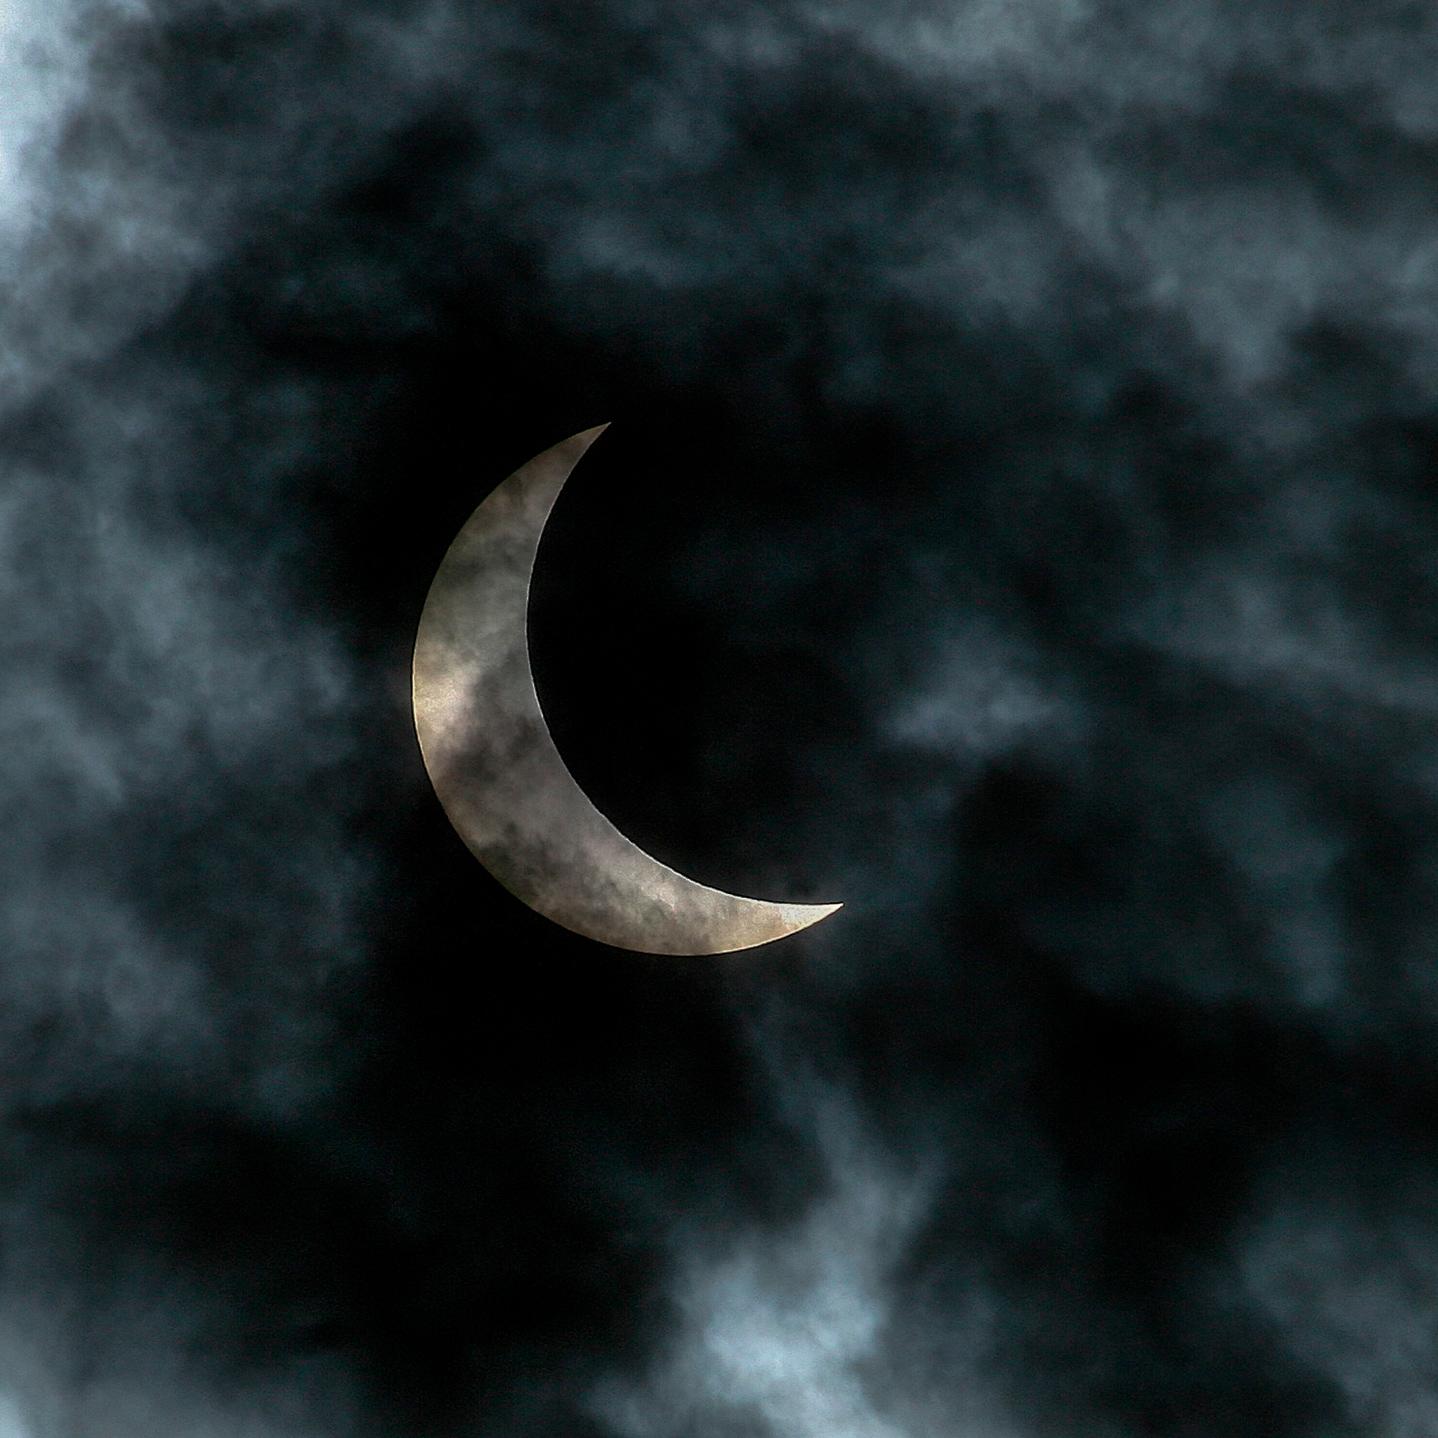 Solar eclipse, 2008